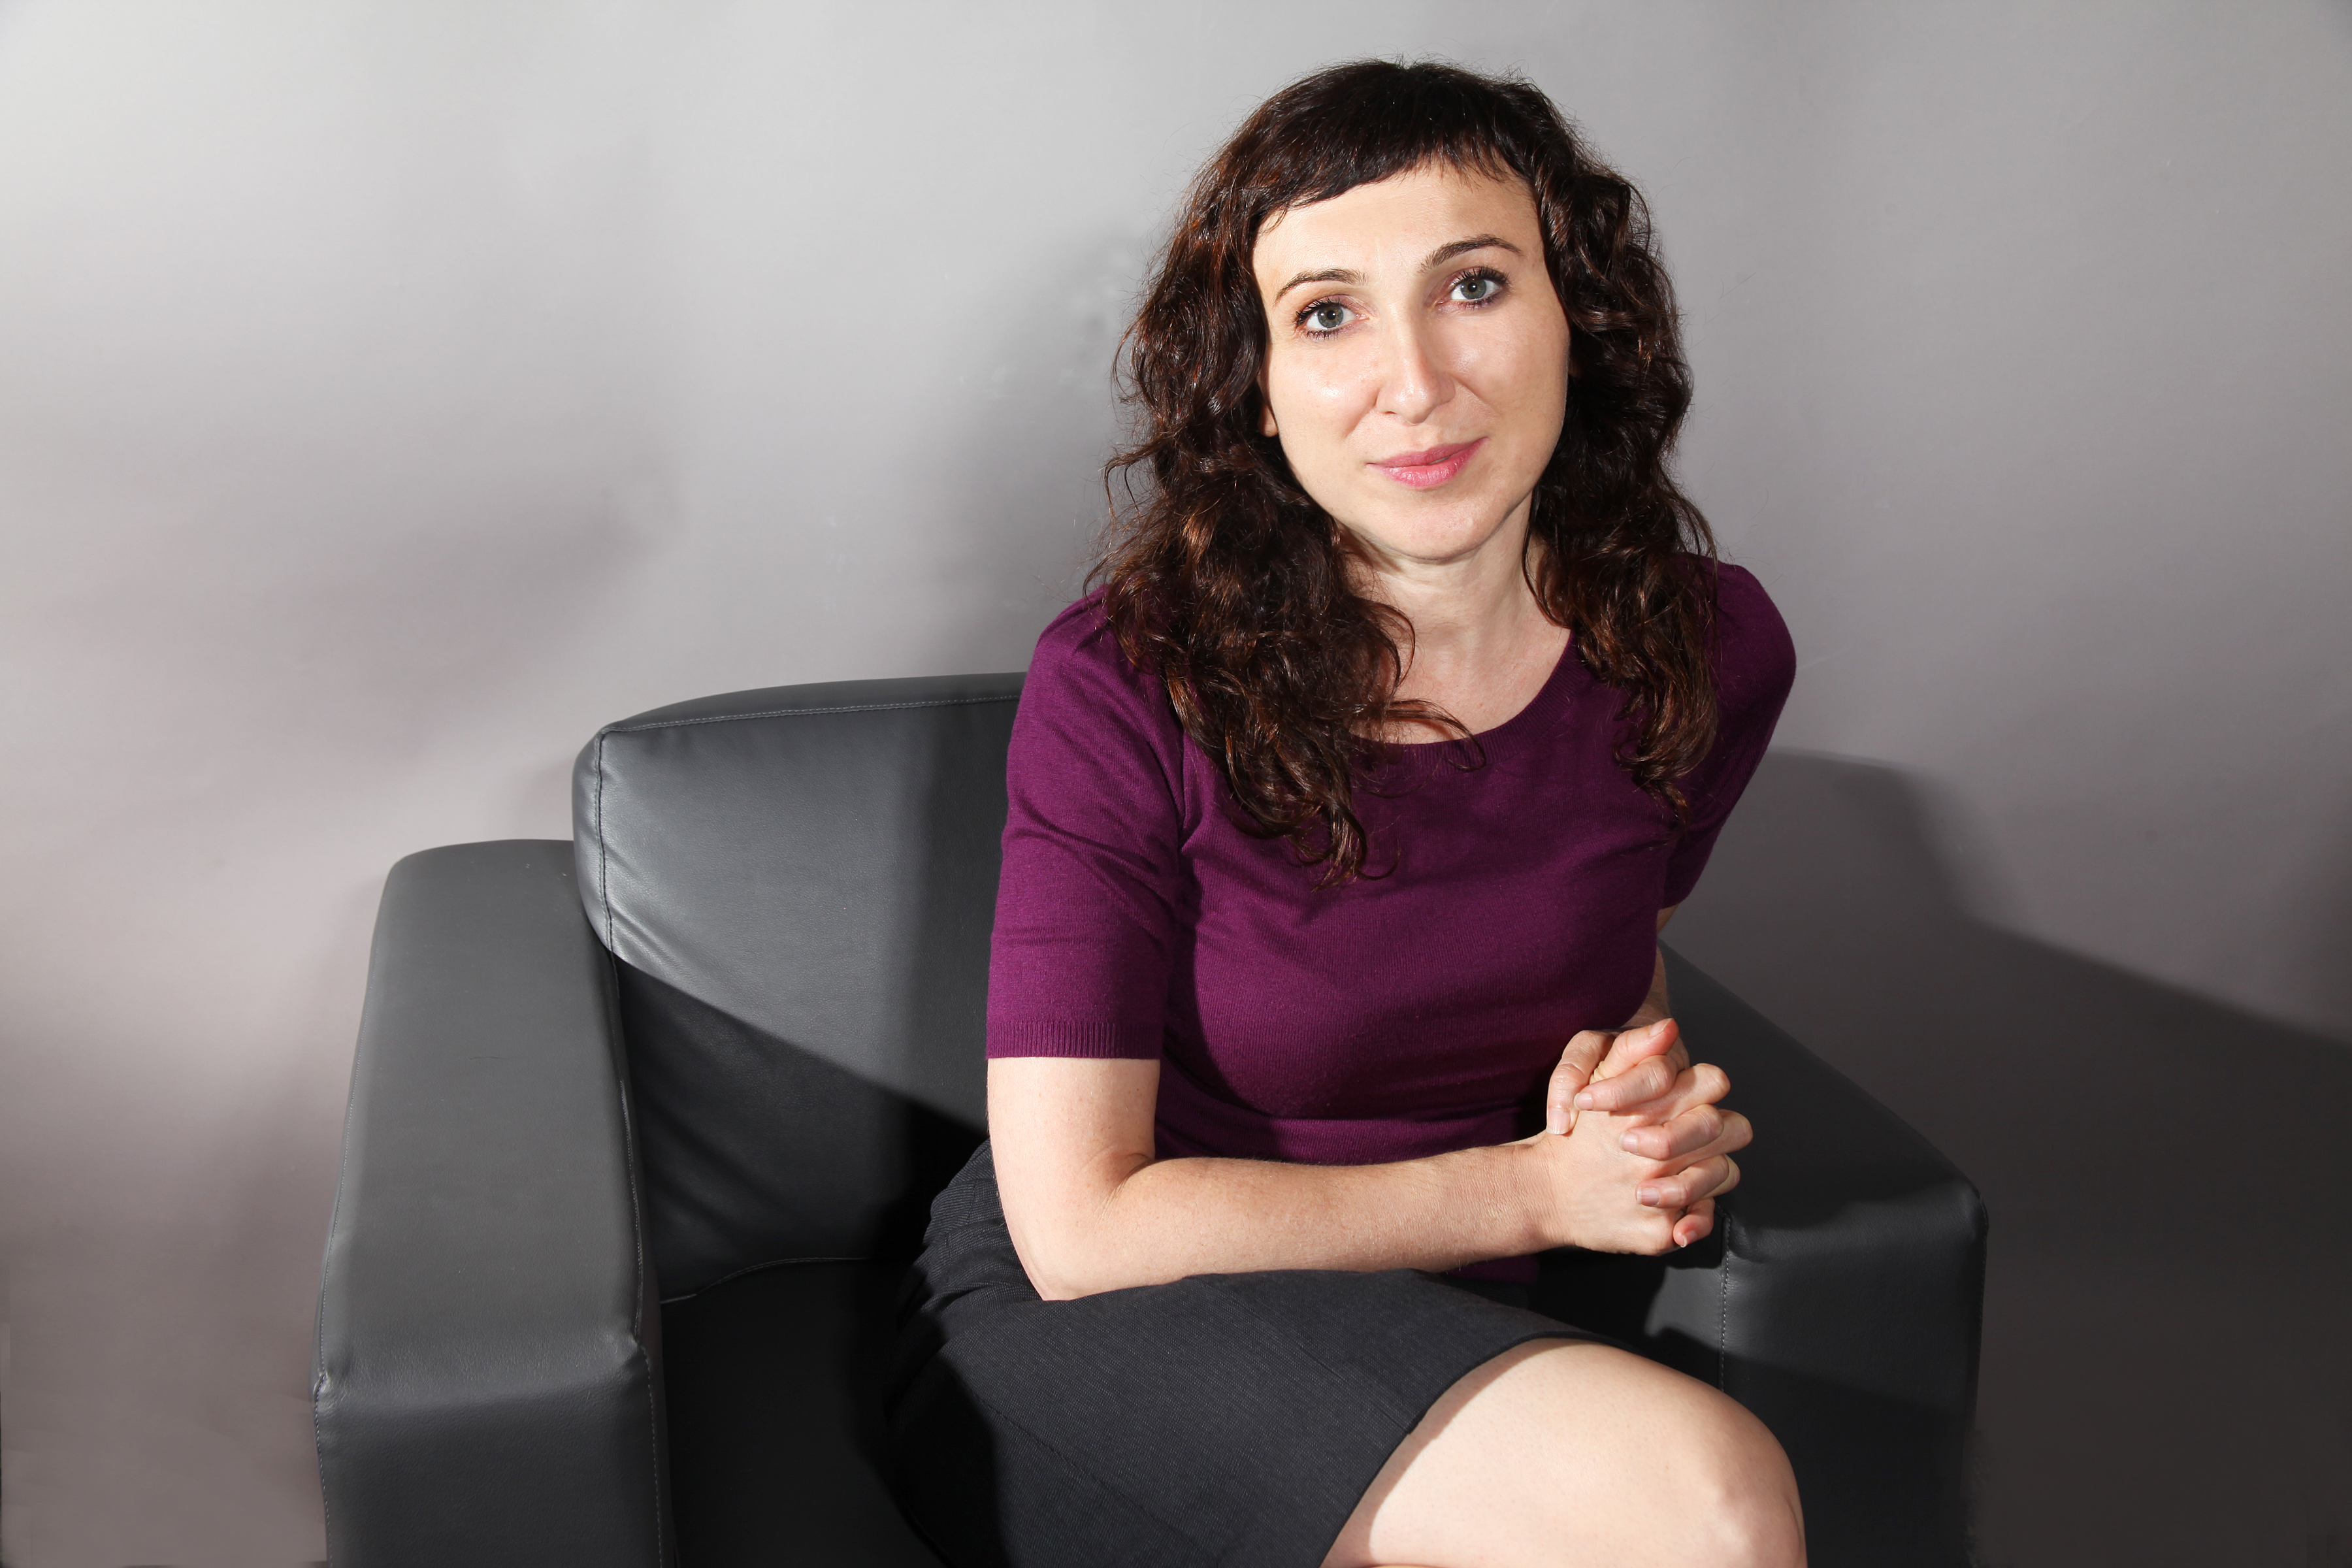 ETFO Editor Izida Zorde